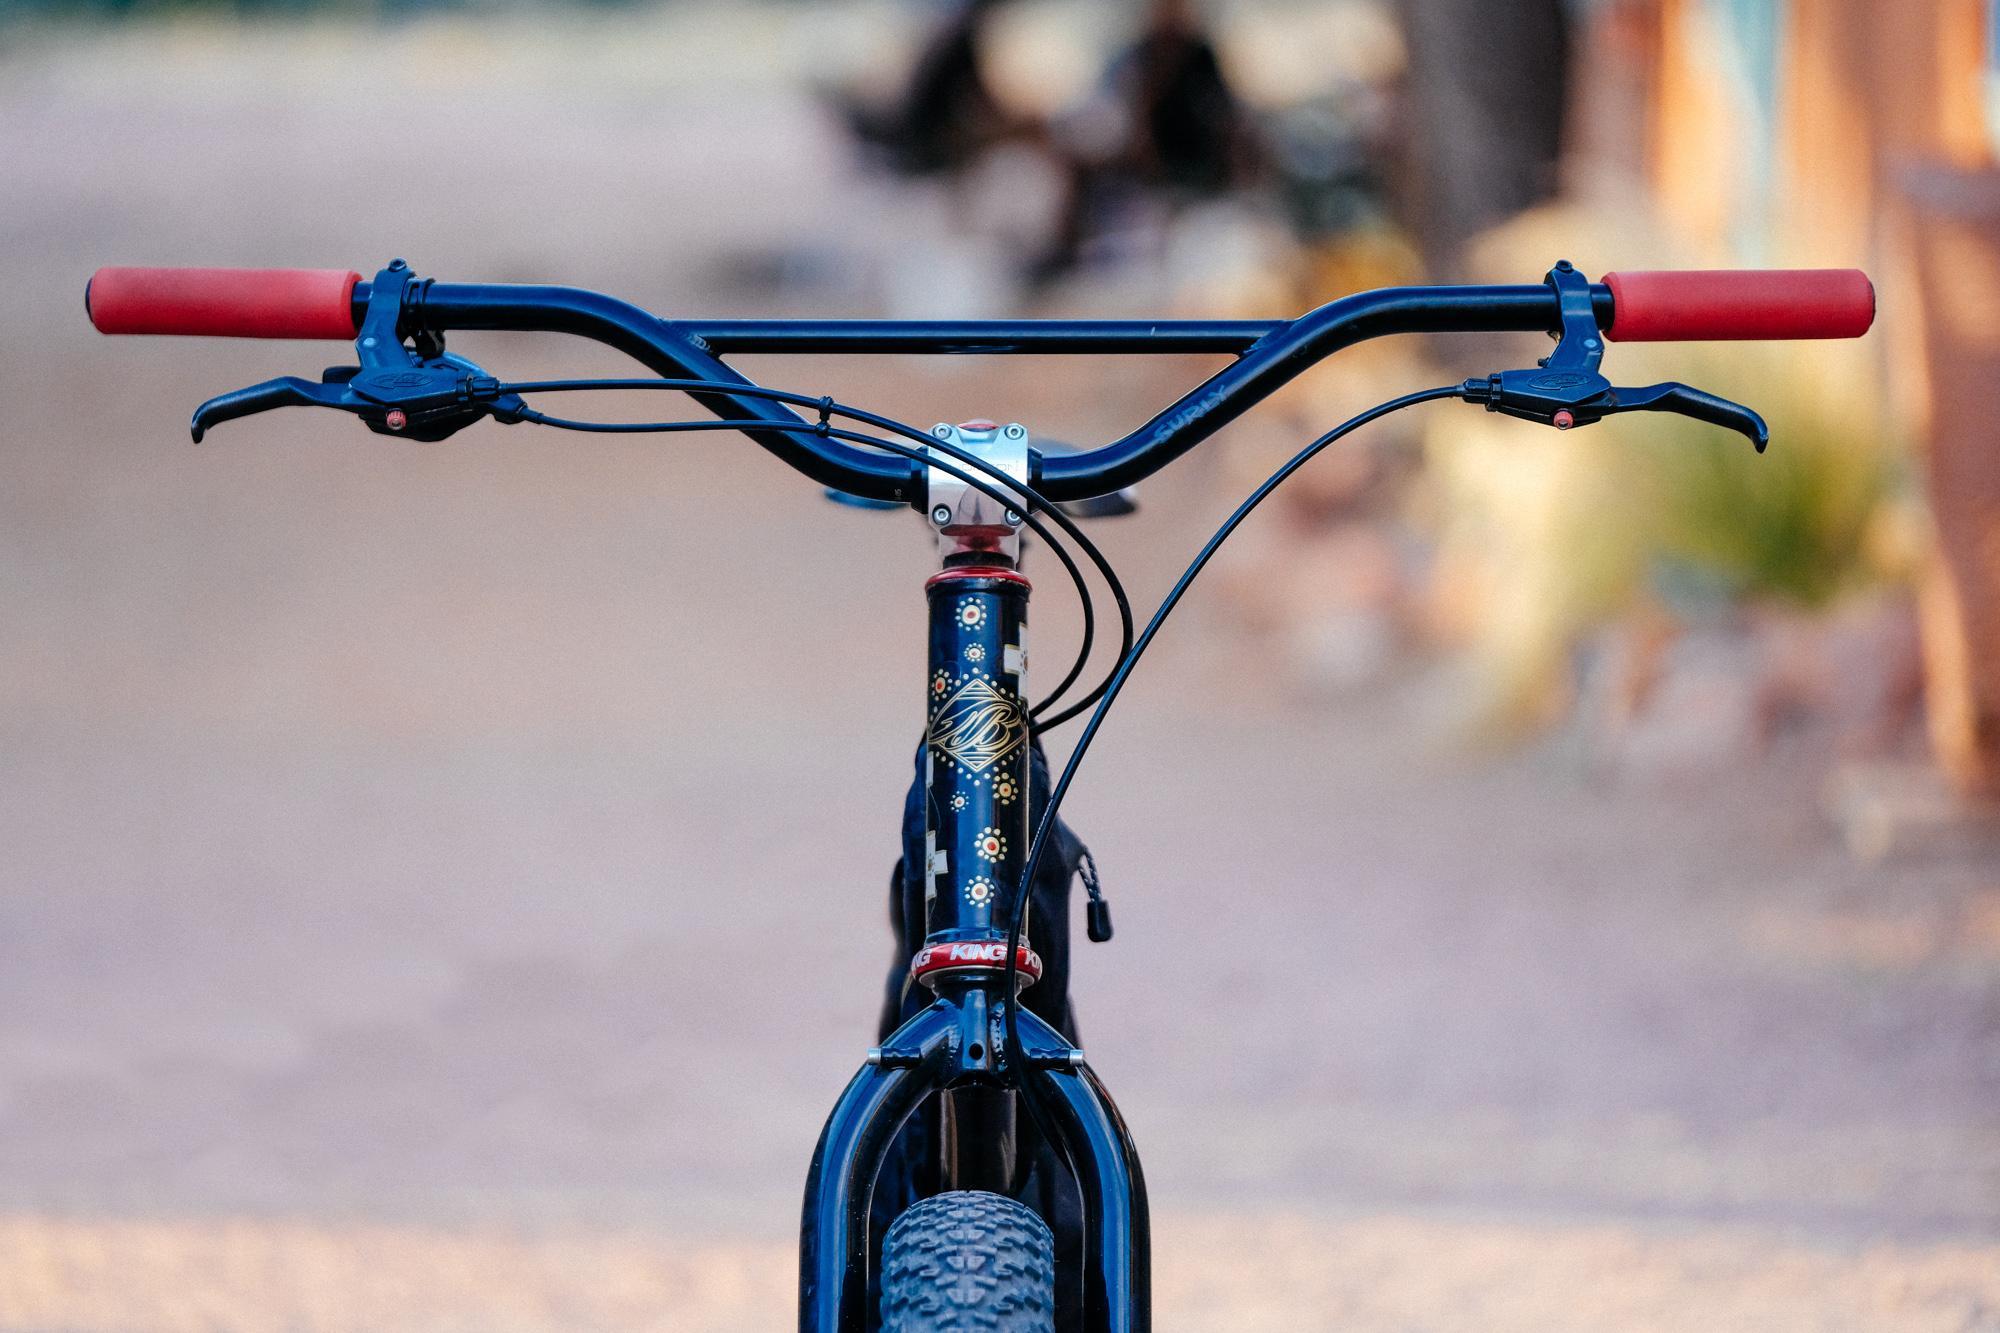 Greg's Lone Wulf Blaze Bicycles Bikepacking Rig!